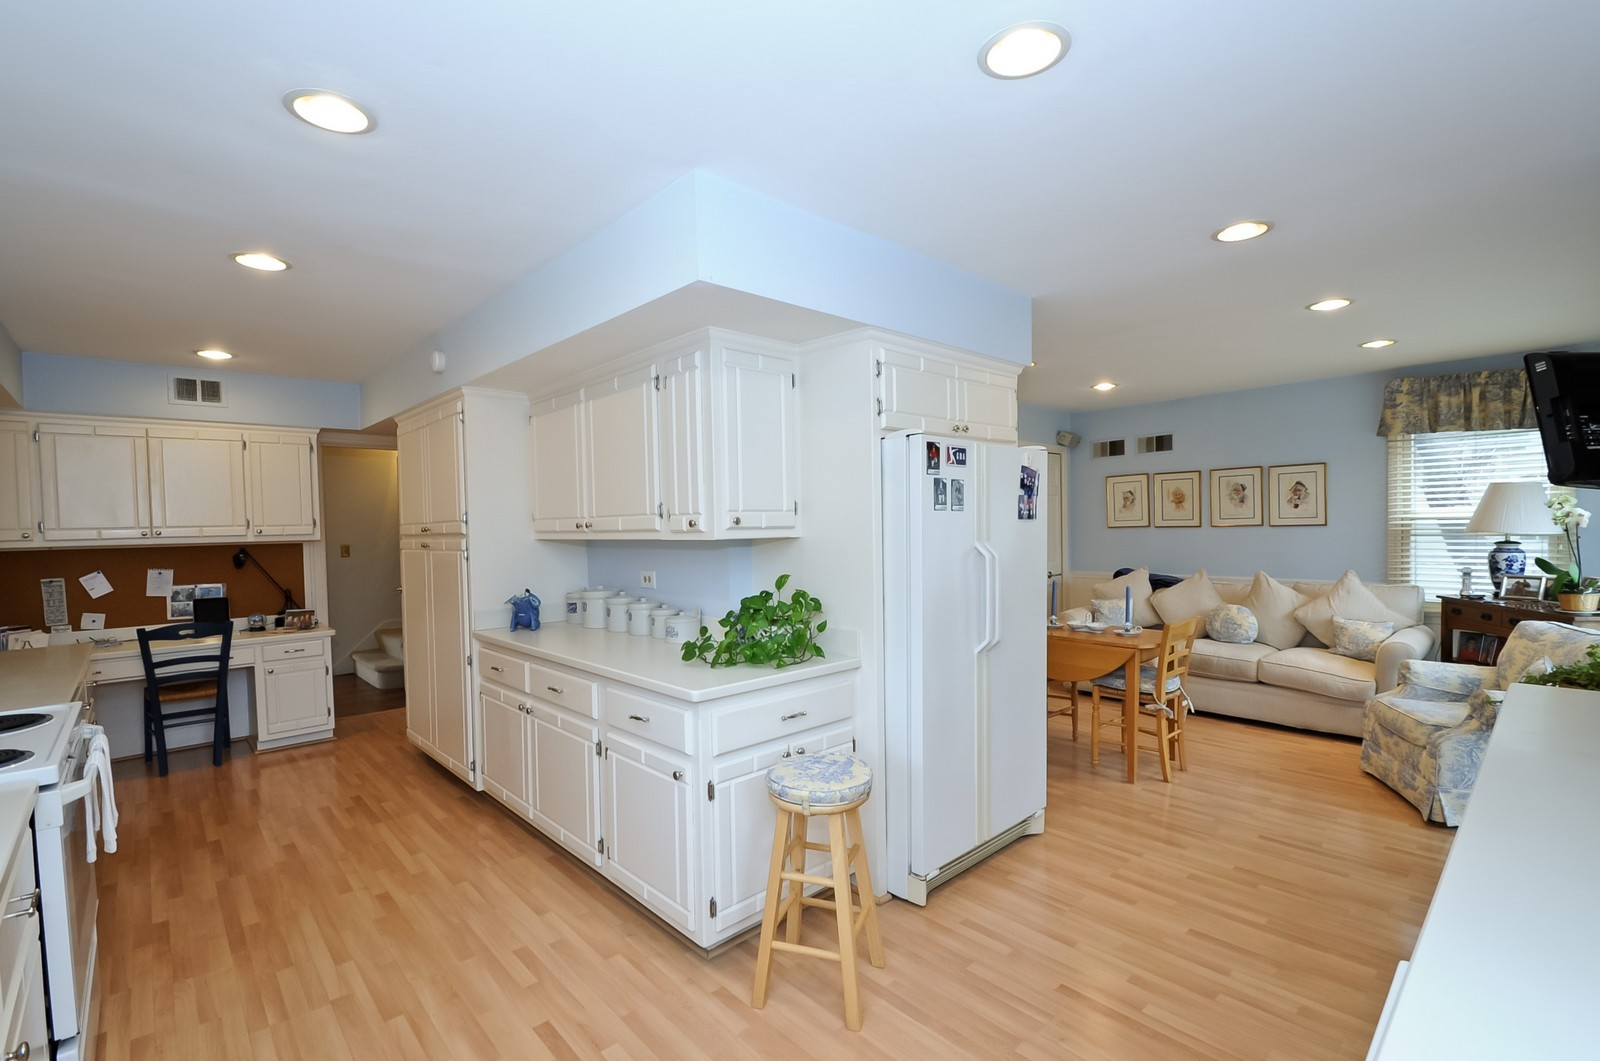 Real Estate Photography - 930 Bob O Link, Highland Park, IL, 60035 - Kitchen